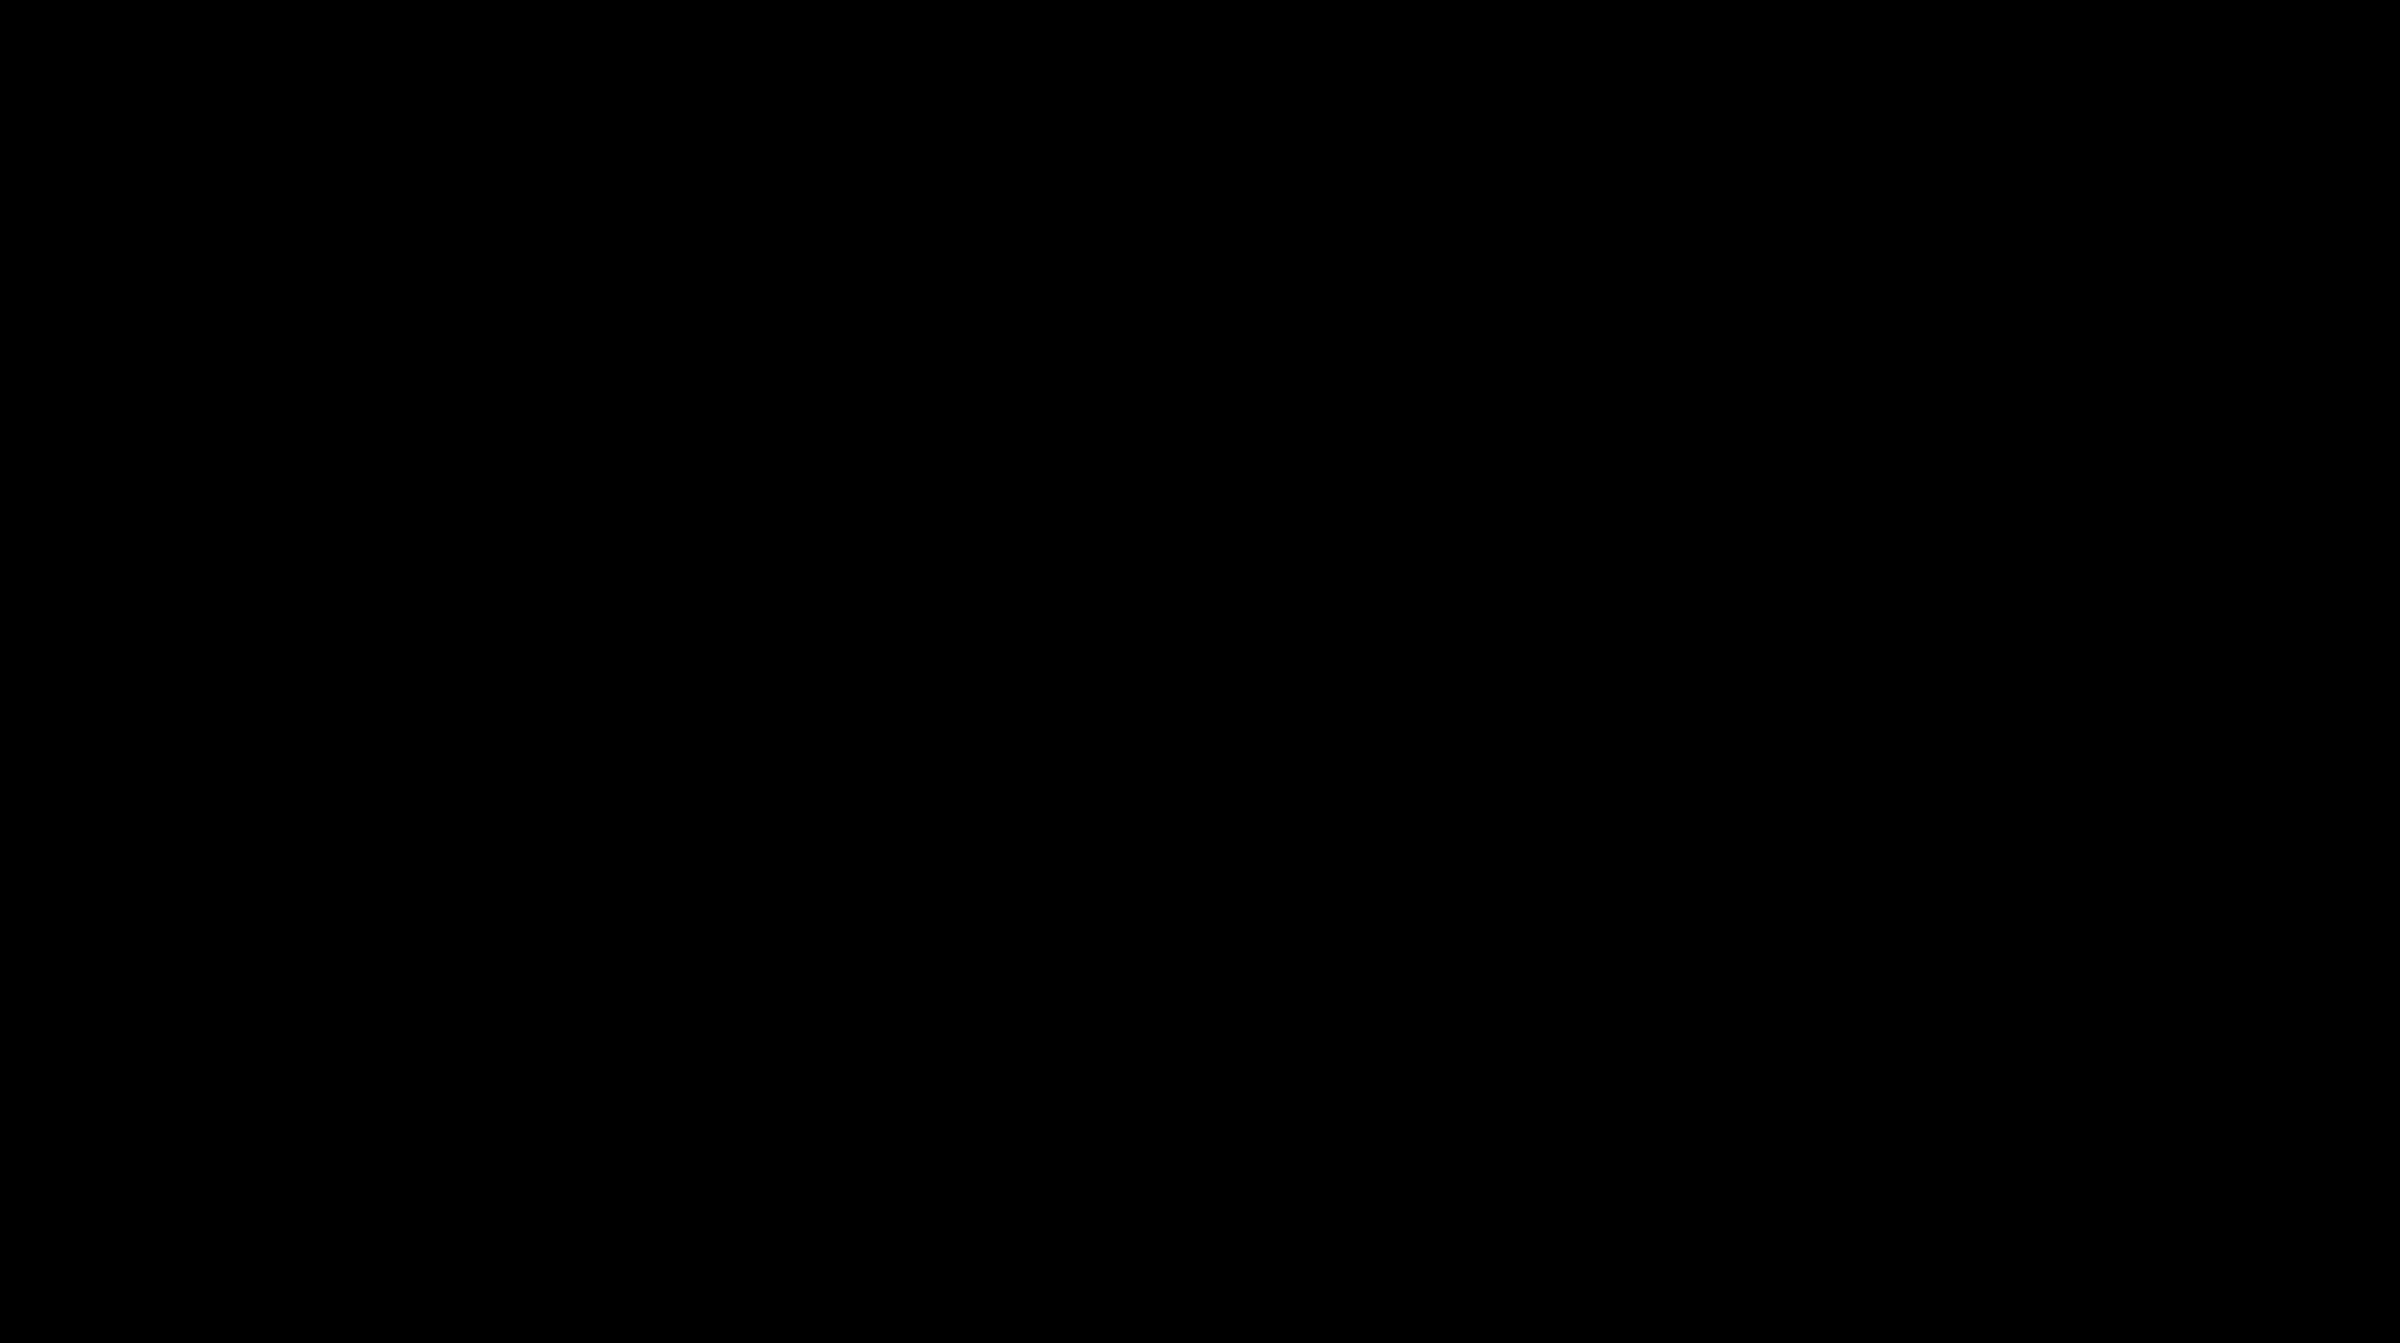 Silhouette clip at getdrawings. Clipart gun line art